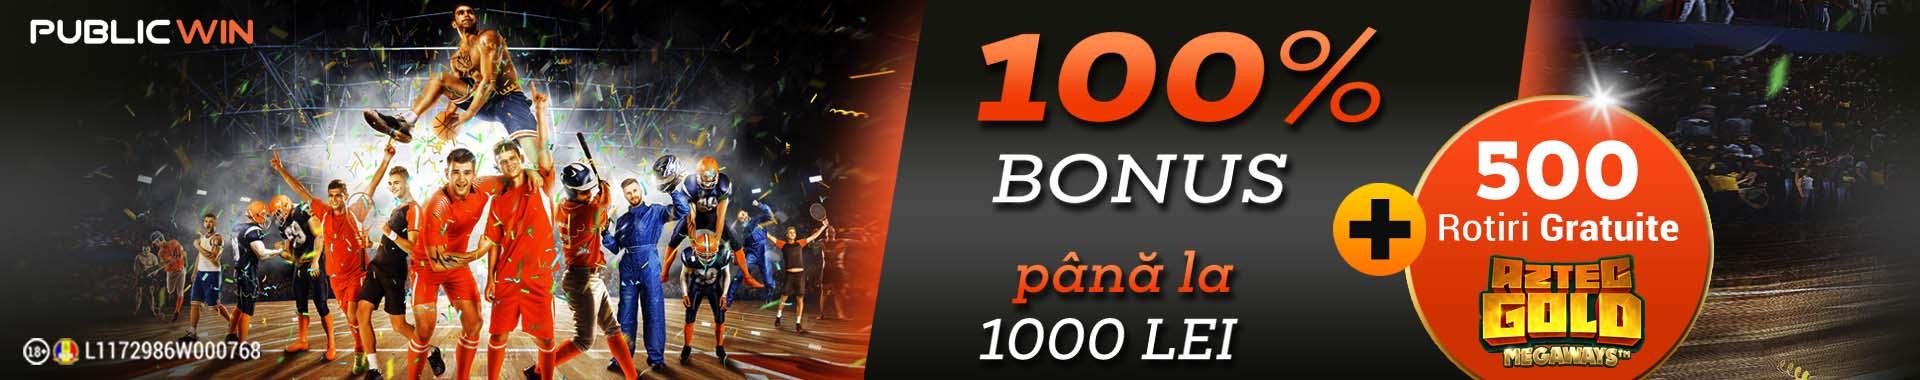 bonus publicwin 1000 lei + 500 free spins